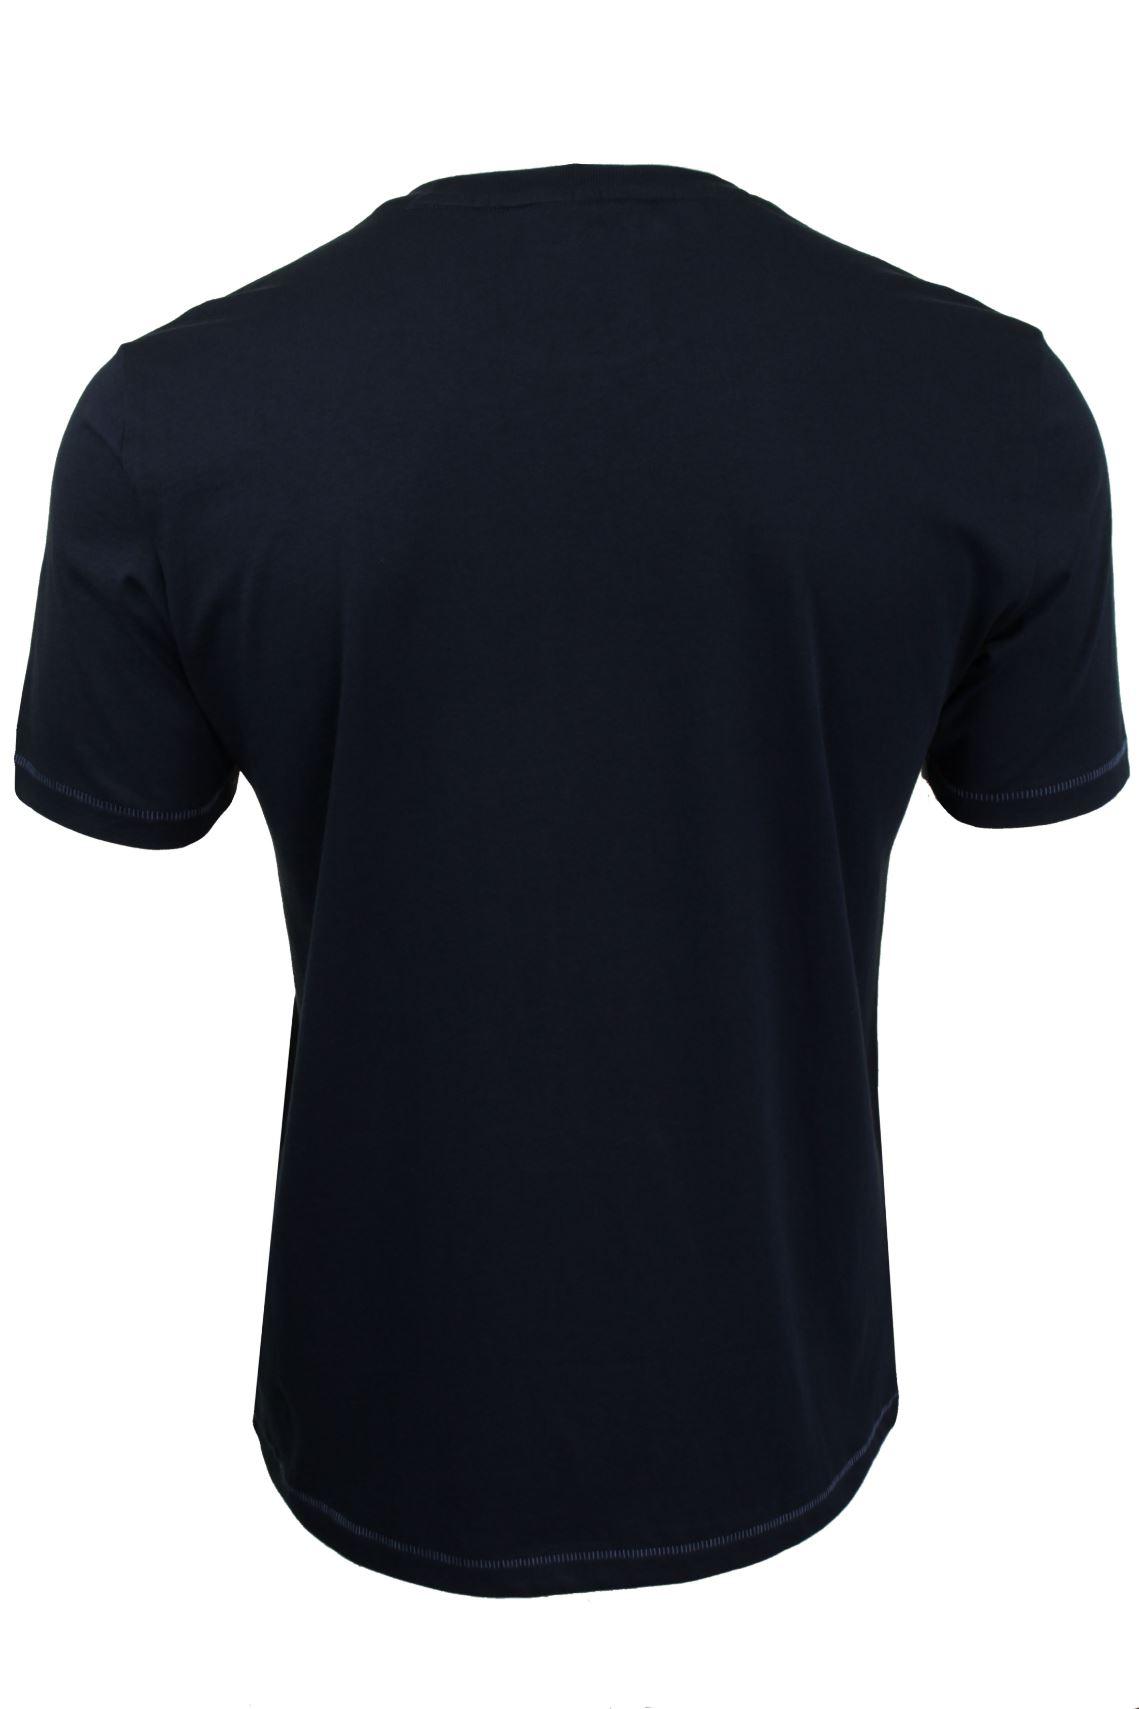 Mens-Target-Mod-Arrow-Print-T-Shirt-by-Ben-Sherman thumbnail 4